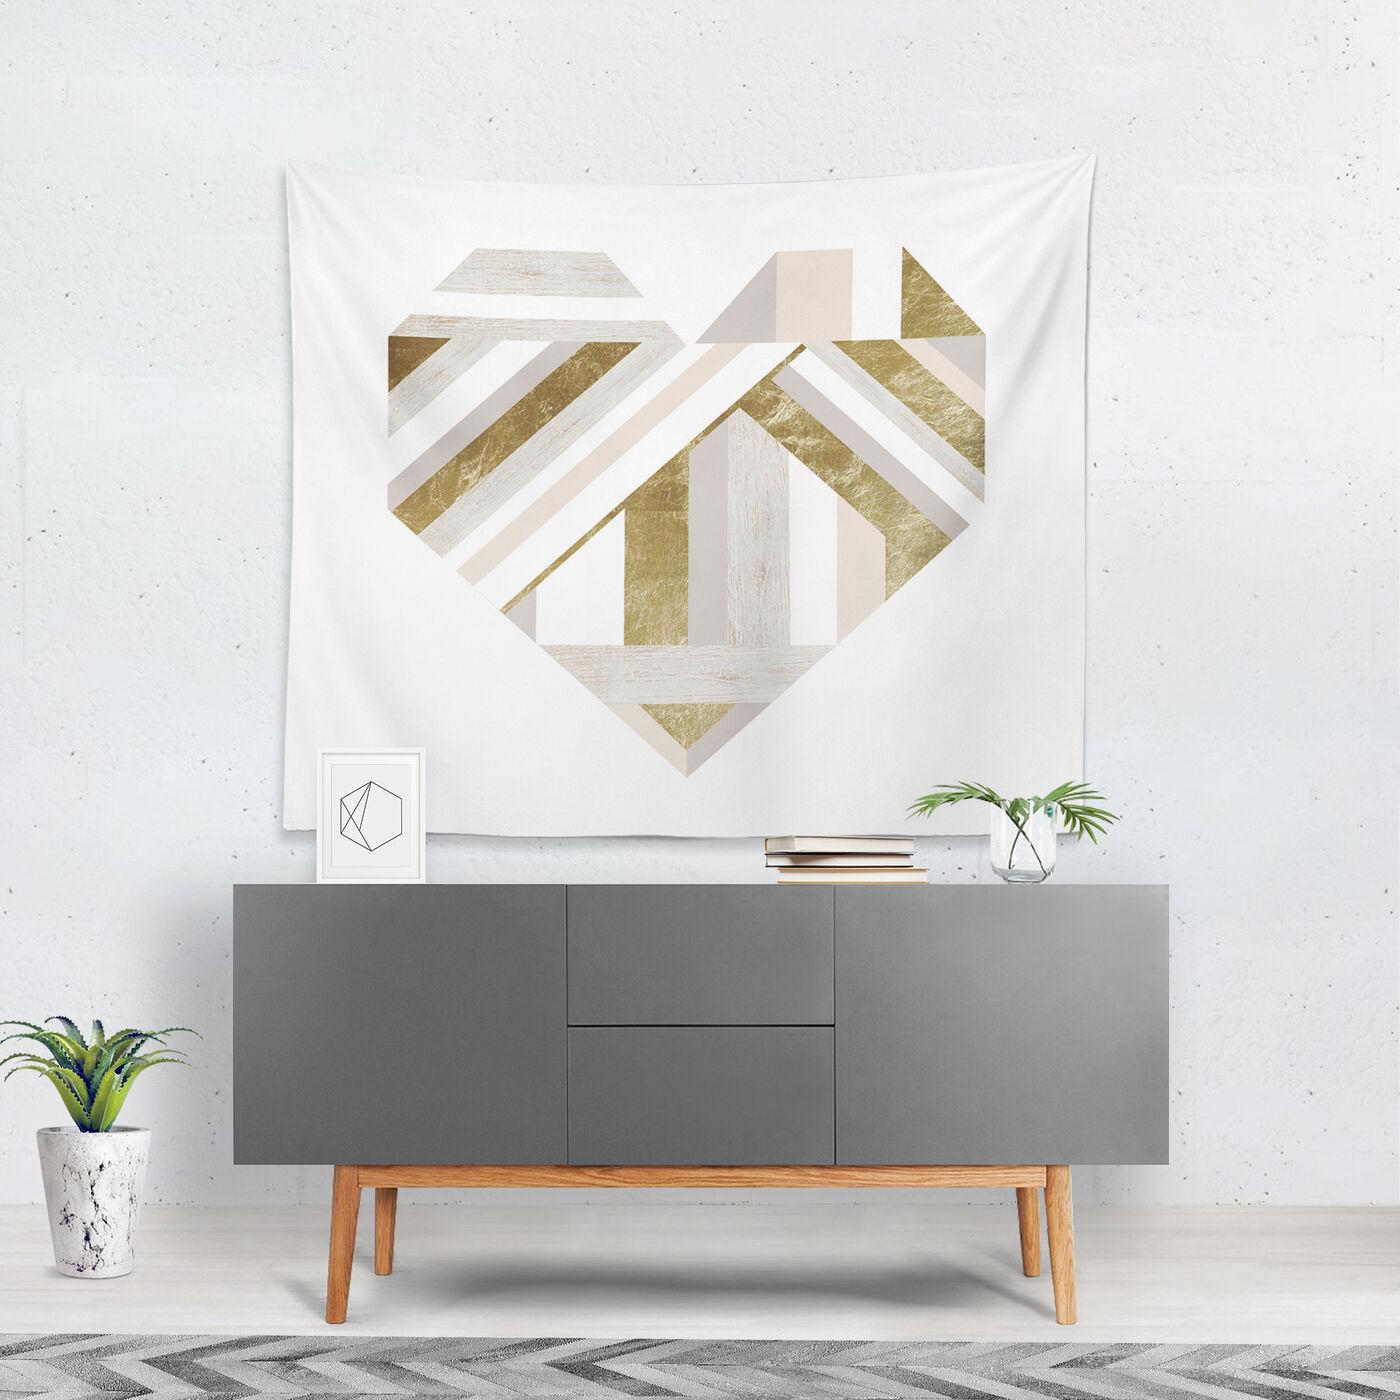 My Wooden Heart Tapestry Art